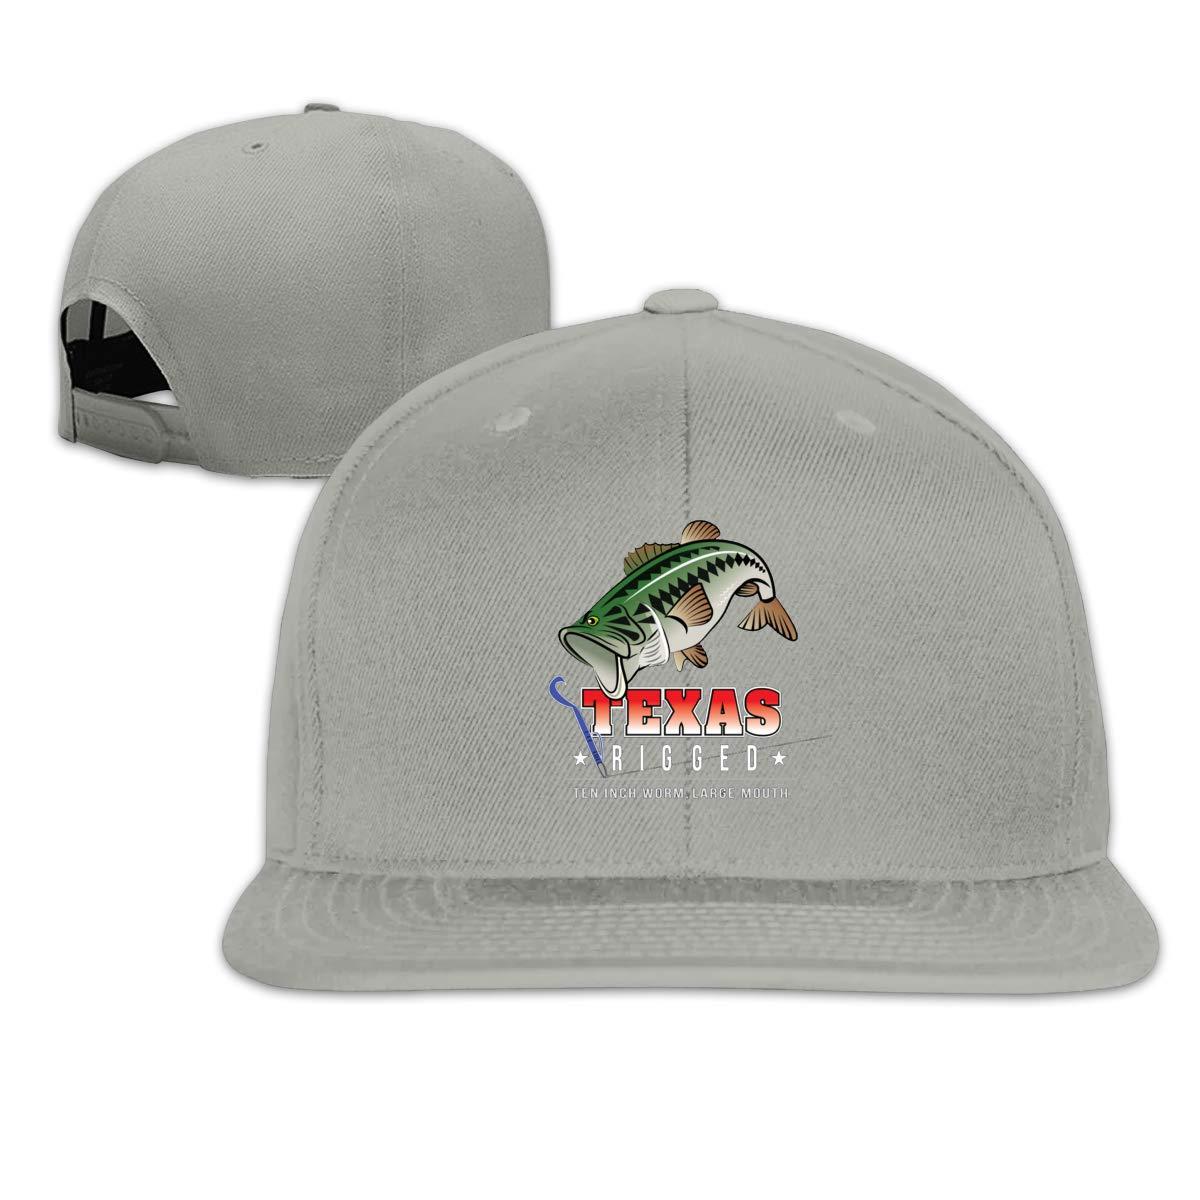 Texas Bass Fish Unisex Adult Hats Classic Baseball Caps Sports Hat Peaked Cap